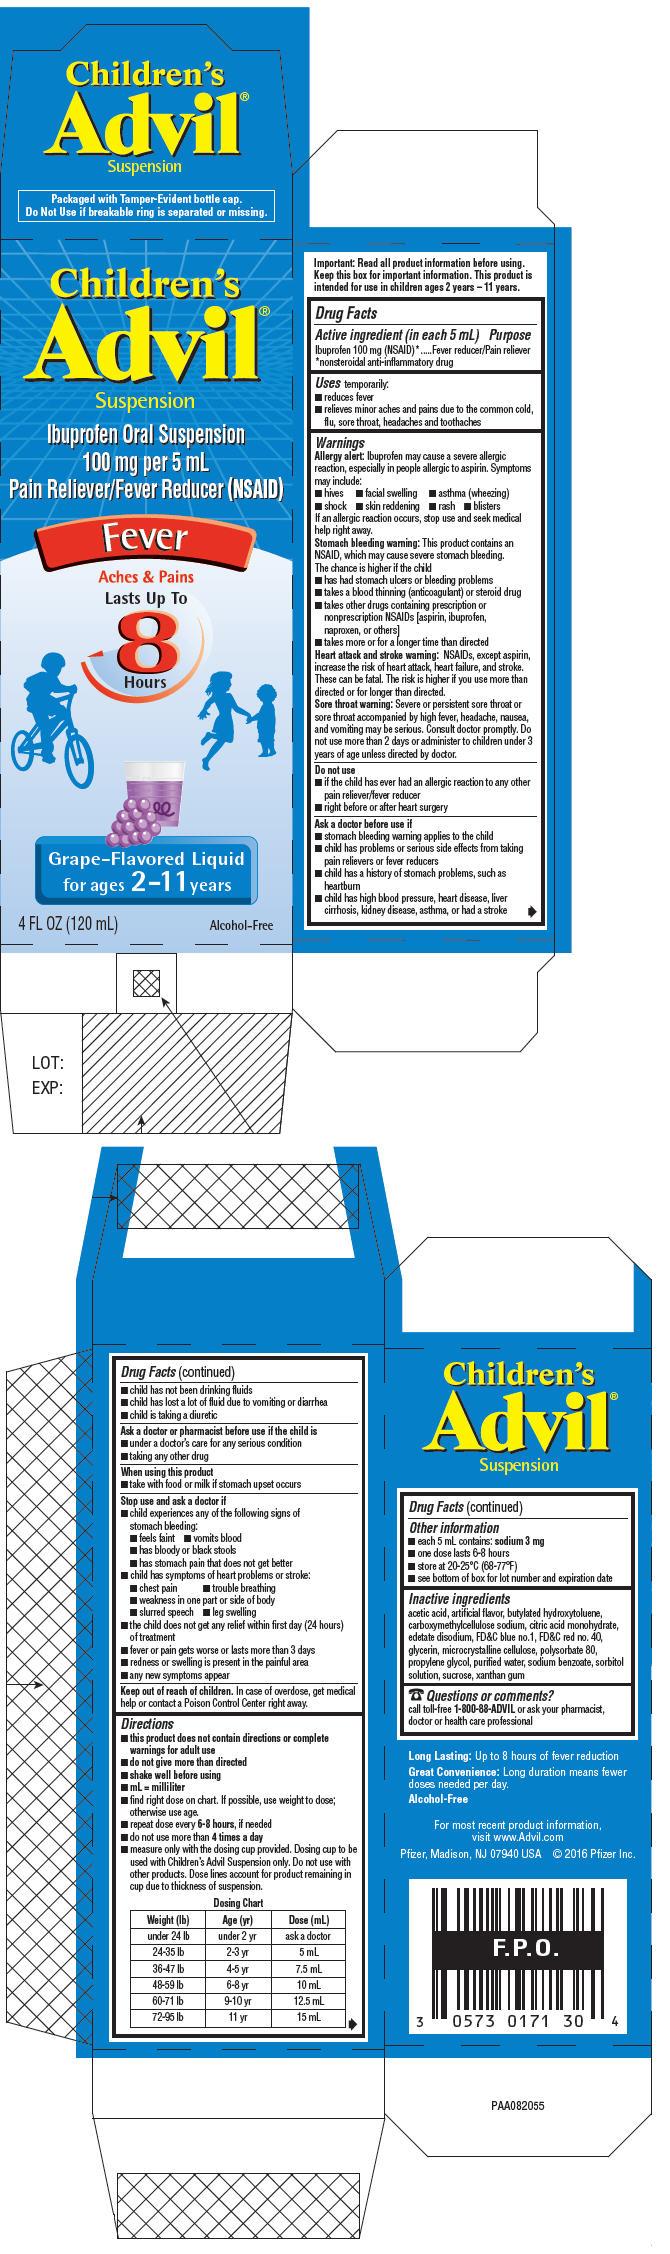 PRINCIPAL DISPLAY PANEL - 120 mL Bottle Carton - Grape-Flavored